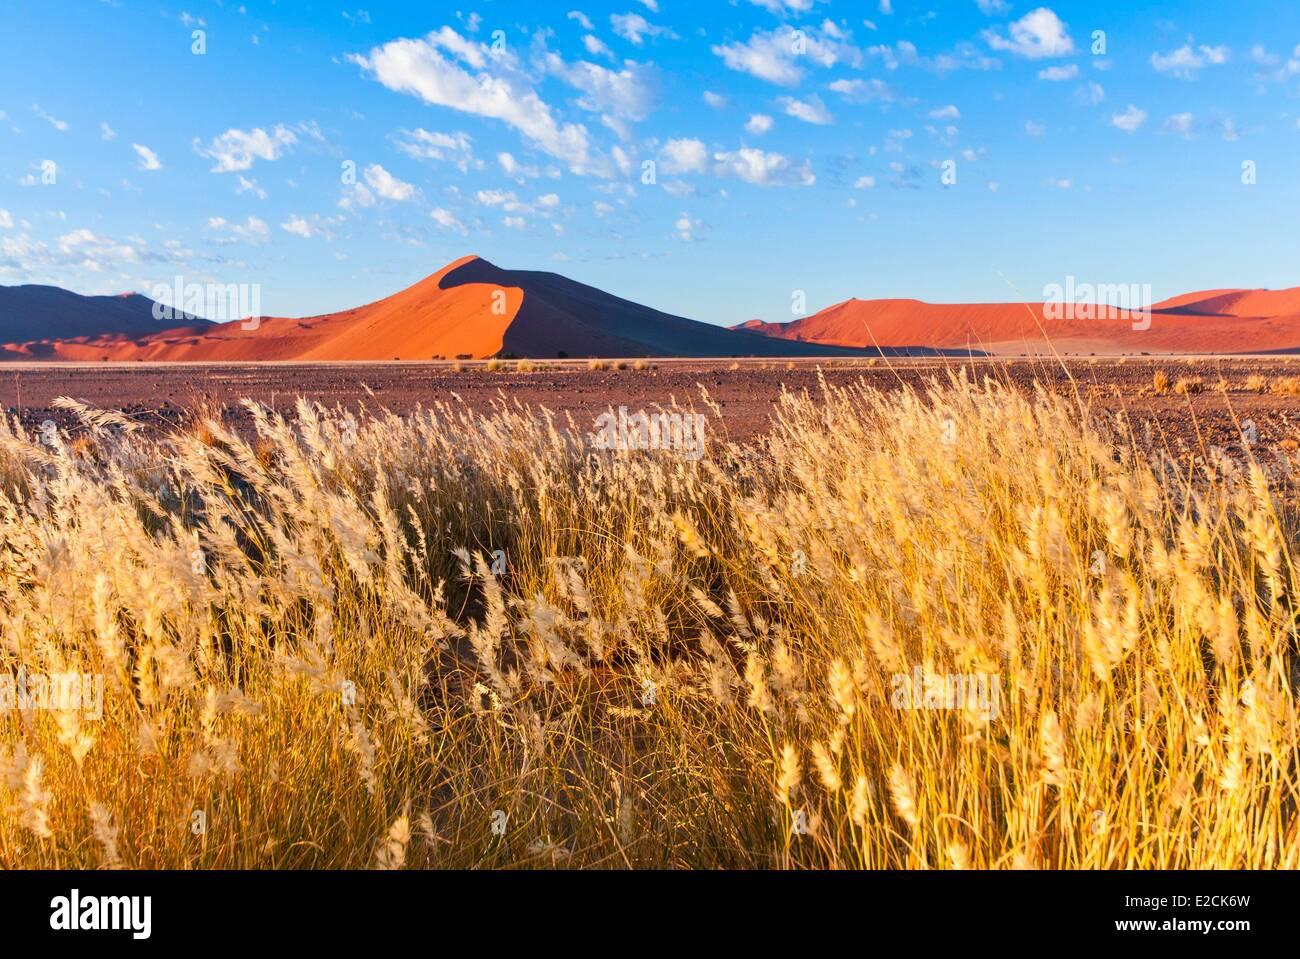 Namibia, Hardap region, Namib desert, Namib Naukluft Park, Sossusvlei, Dune 45, Fox-brush (Aristida Hordeacea) - Stock Image